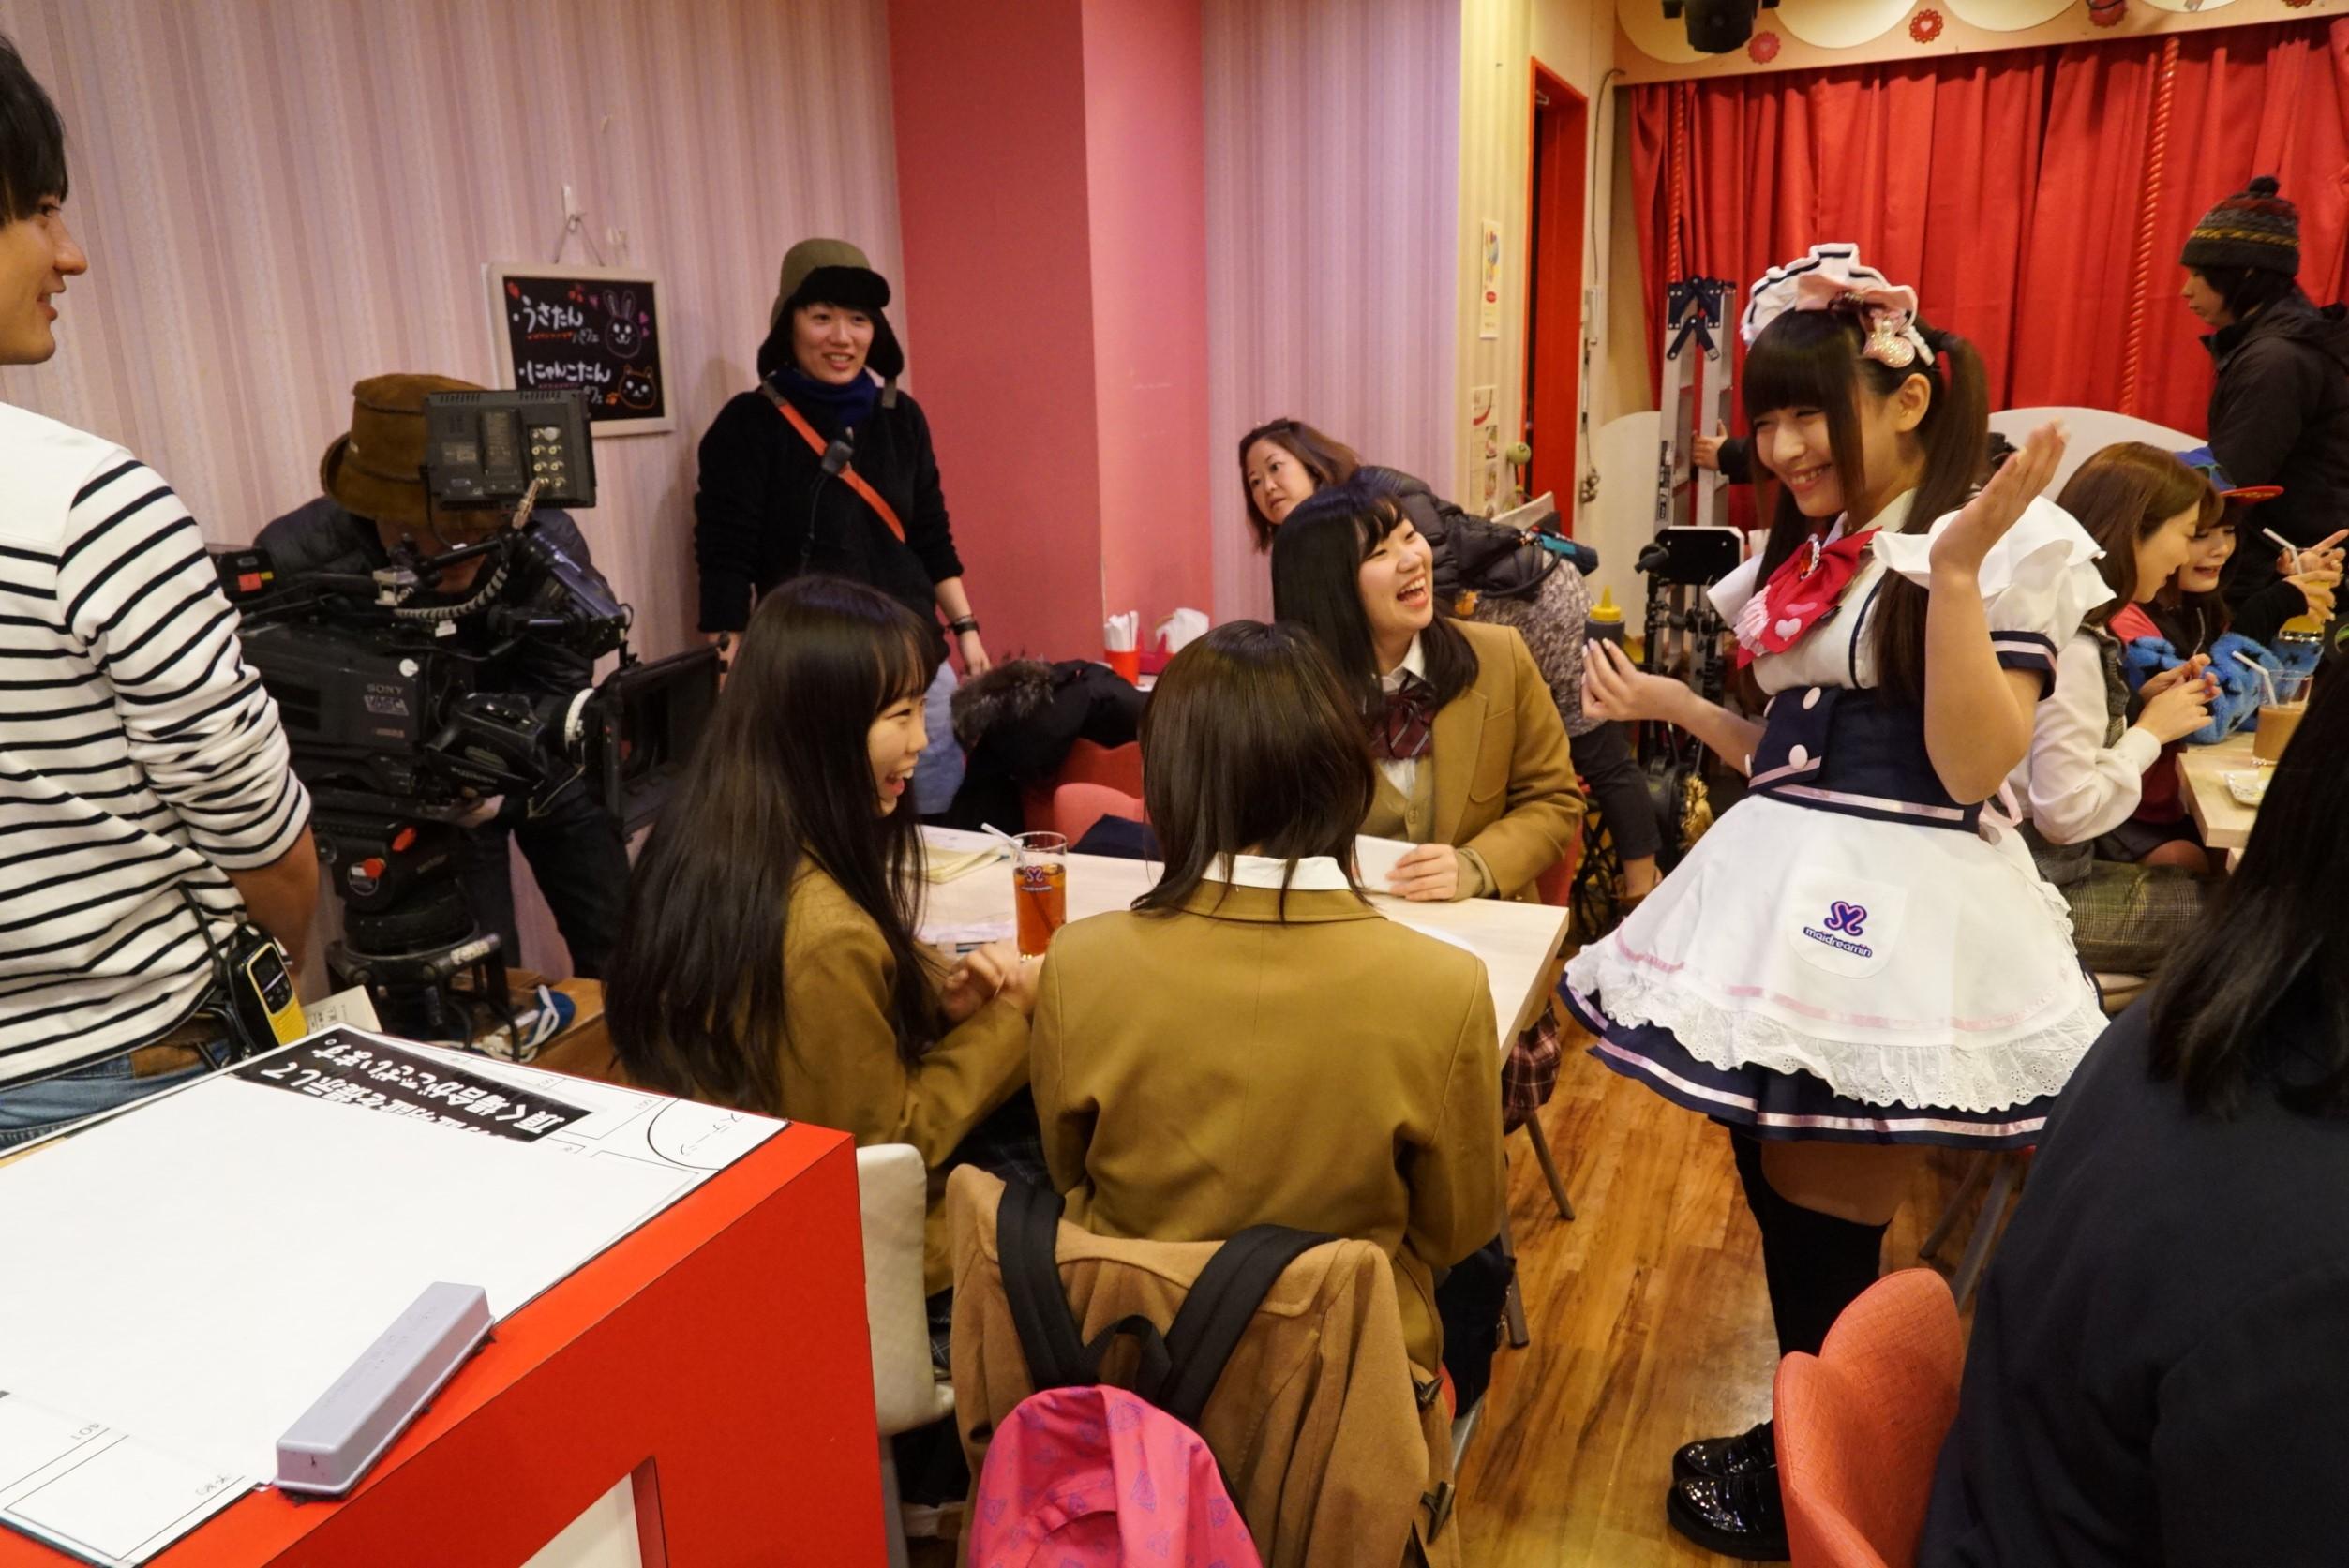 NekoPOP-maidreamin-Kuragehime-Princess-Jellyfish-Fuji-Tv-ep3-2